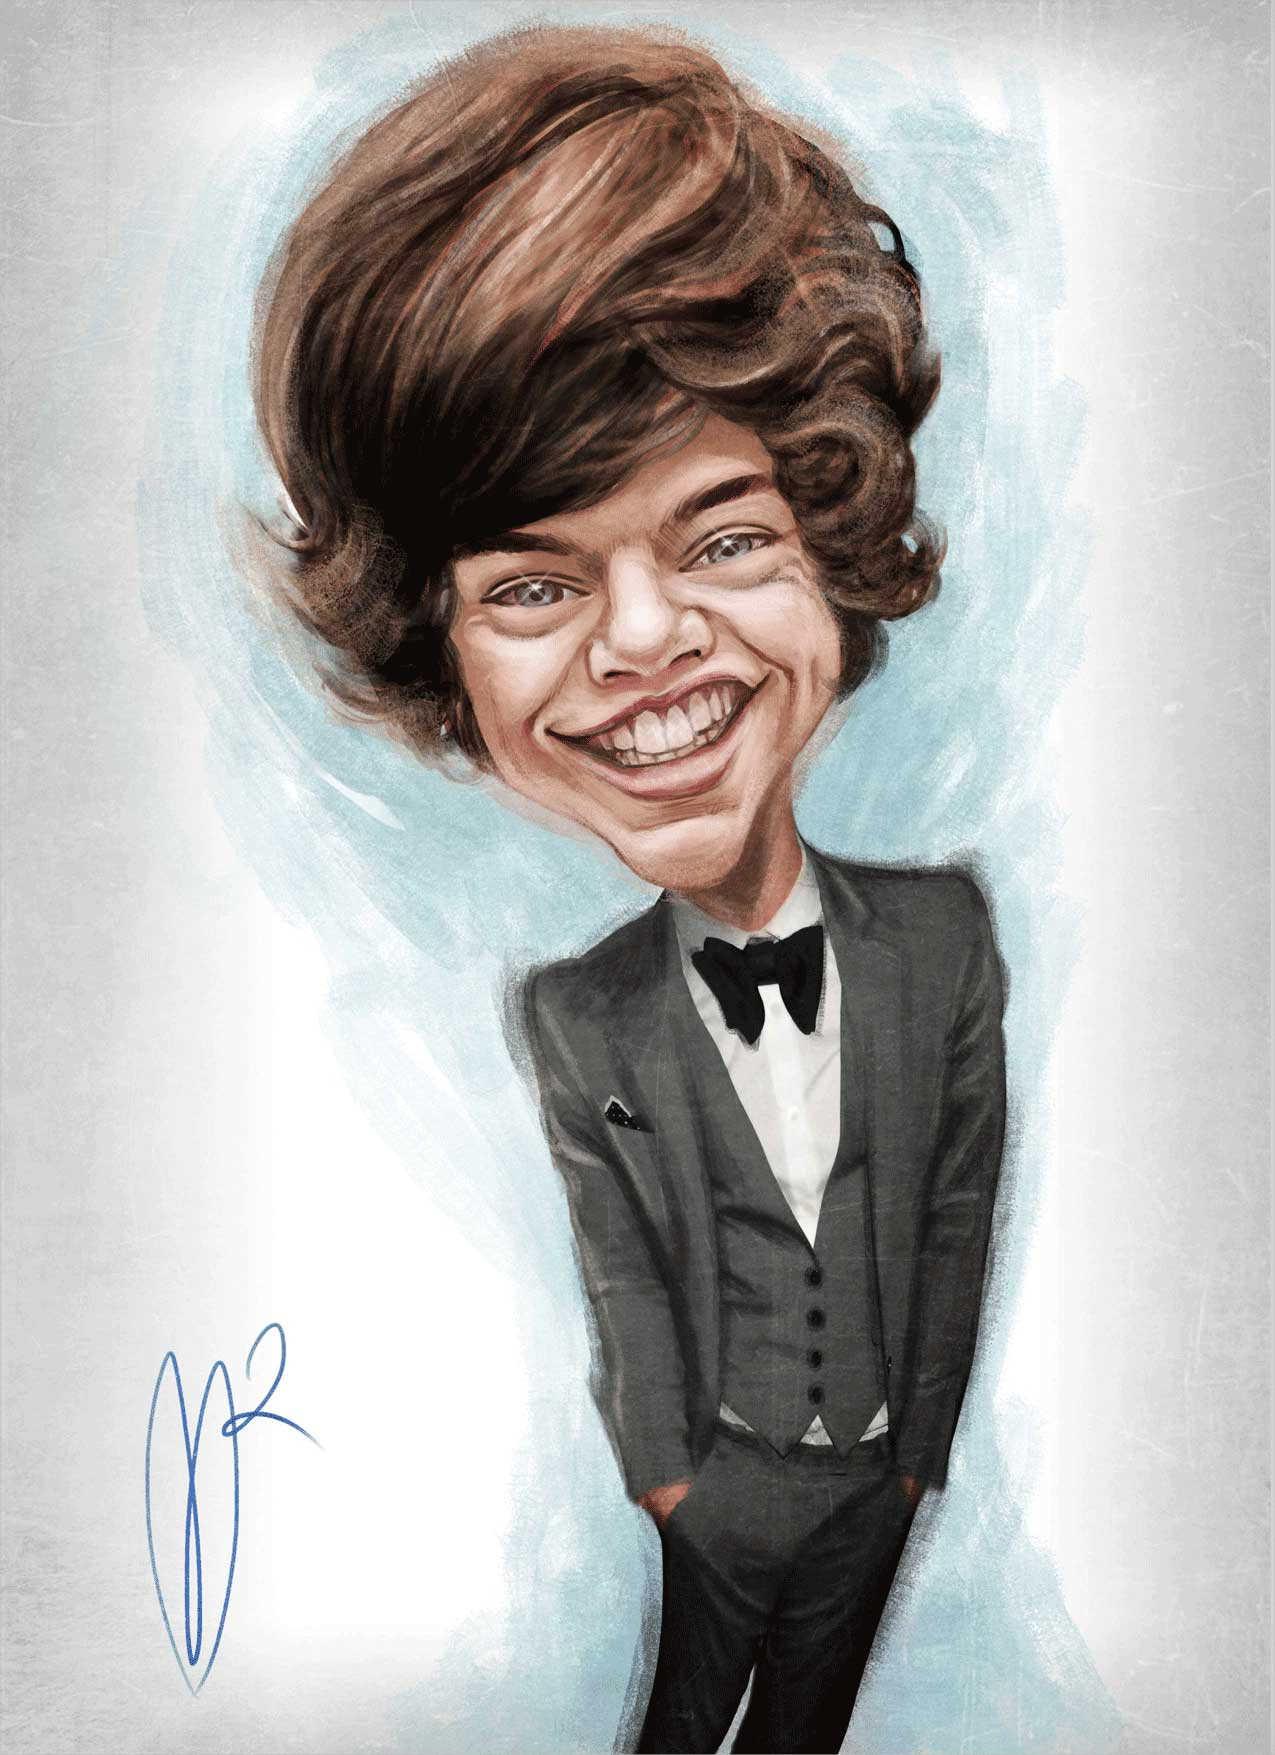 Harry Styles Digital Caricature Painting